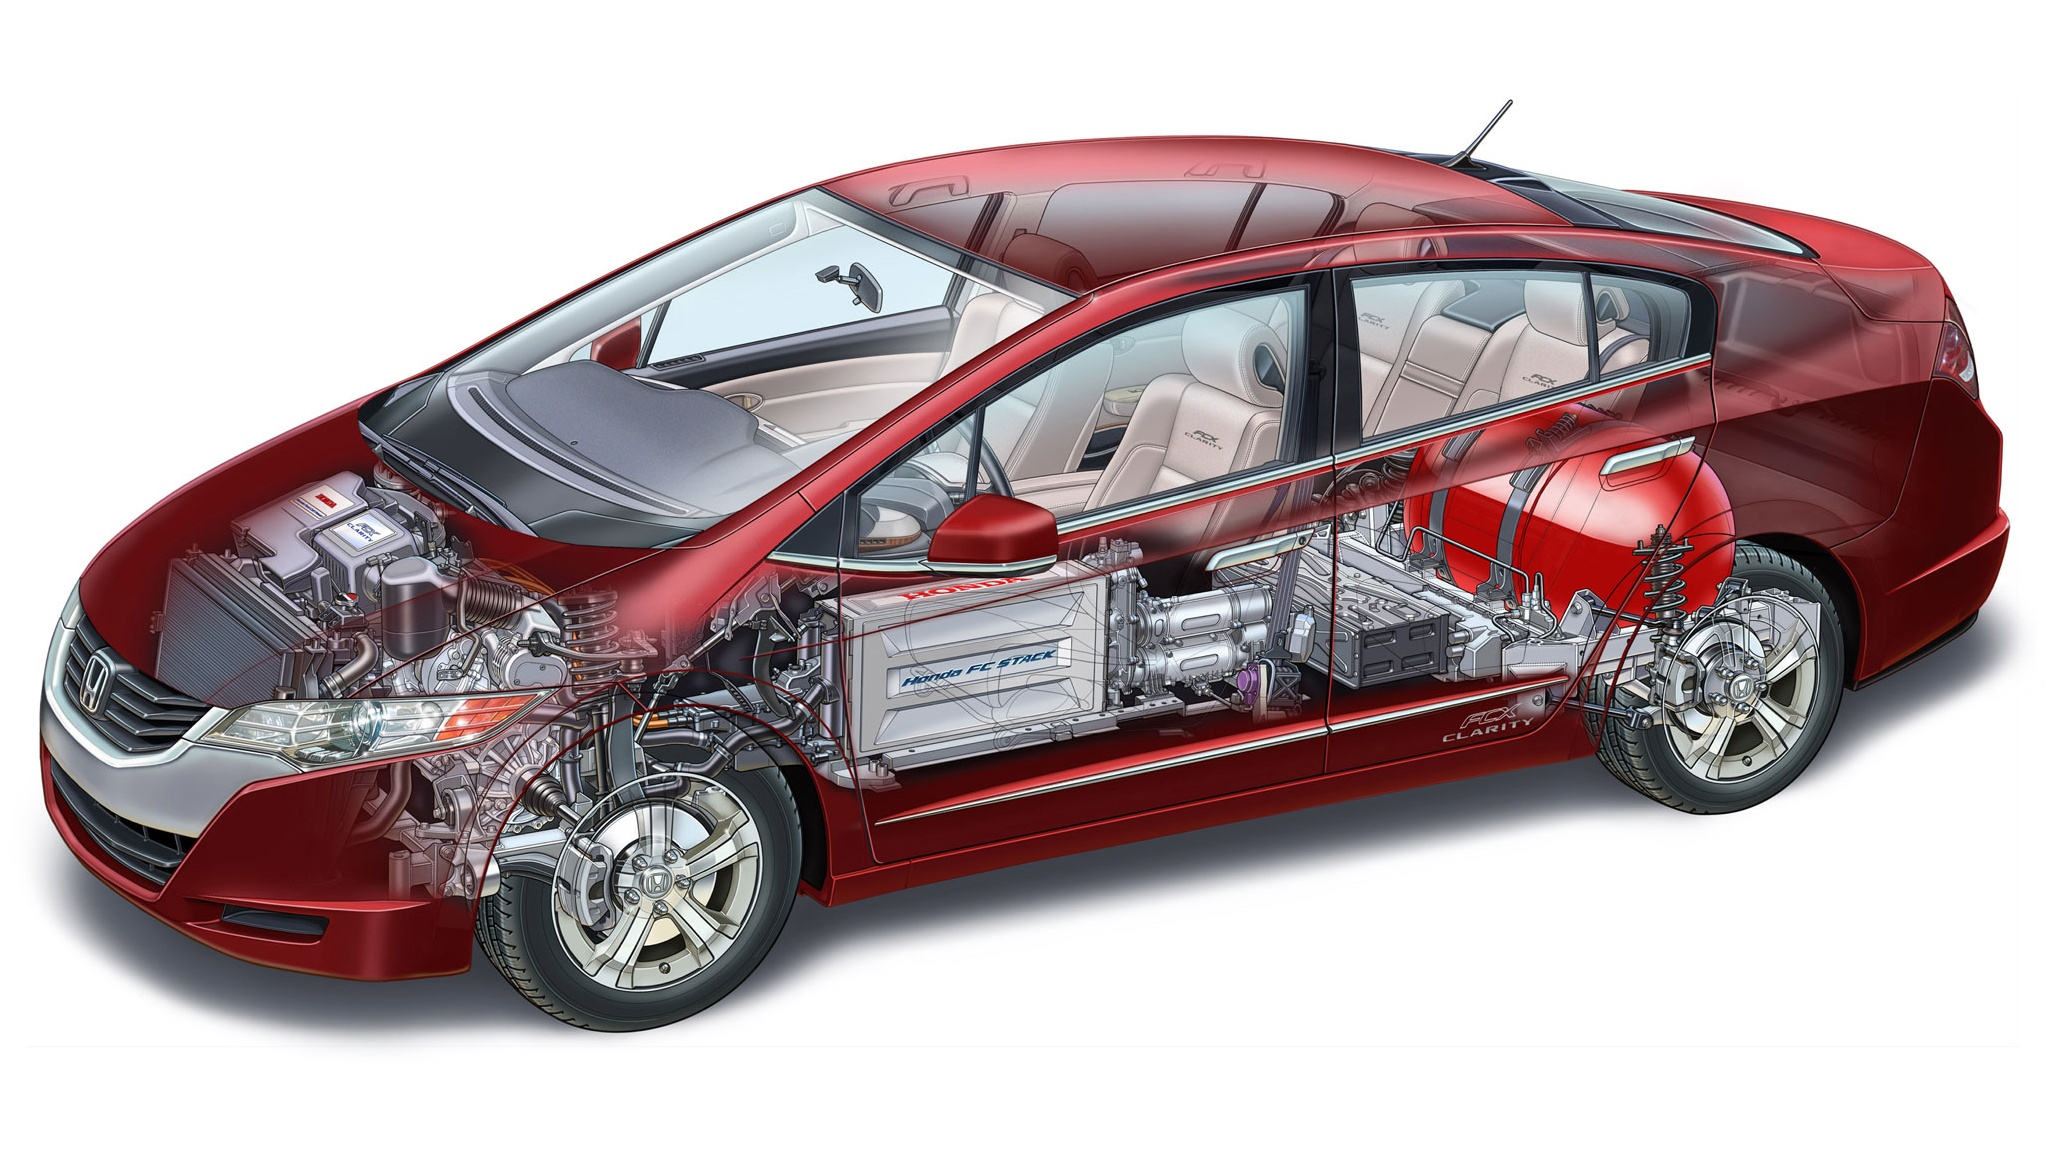 2011 Honda FCX Clarity